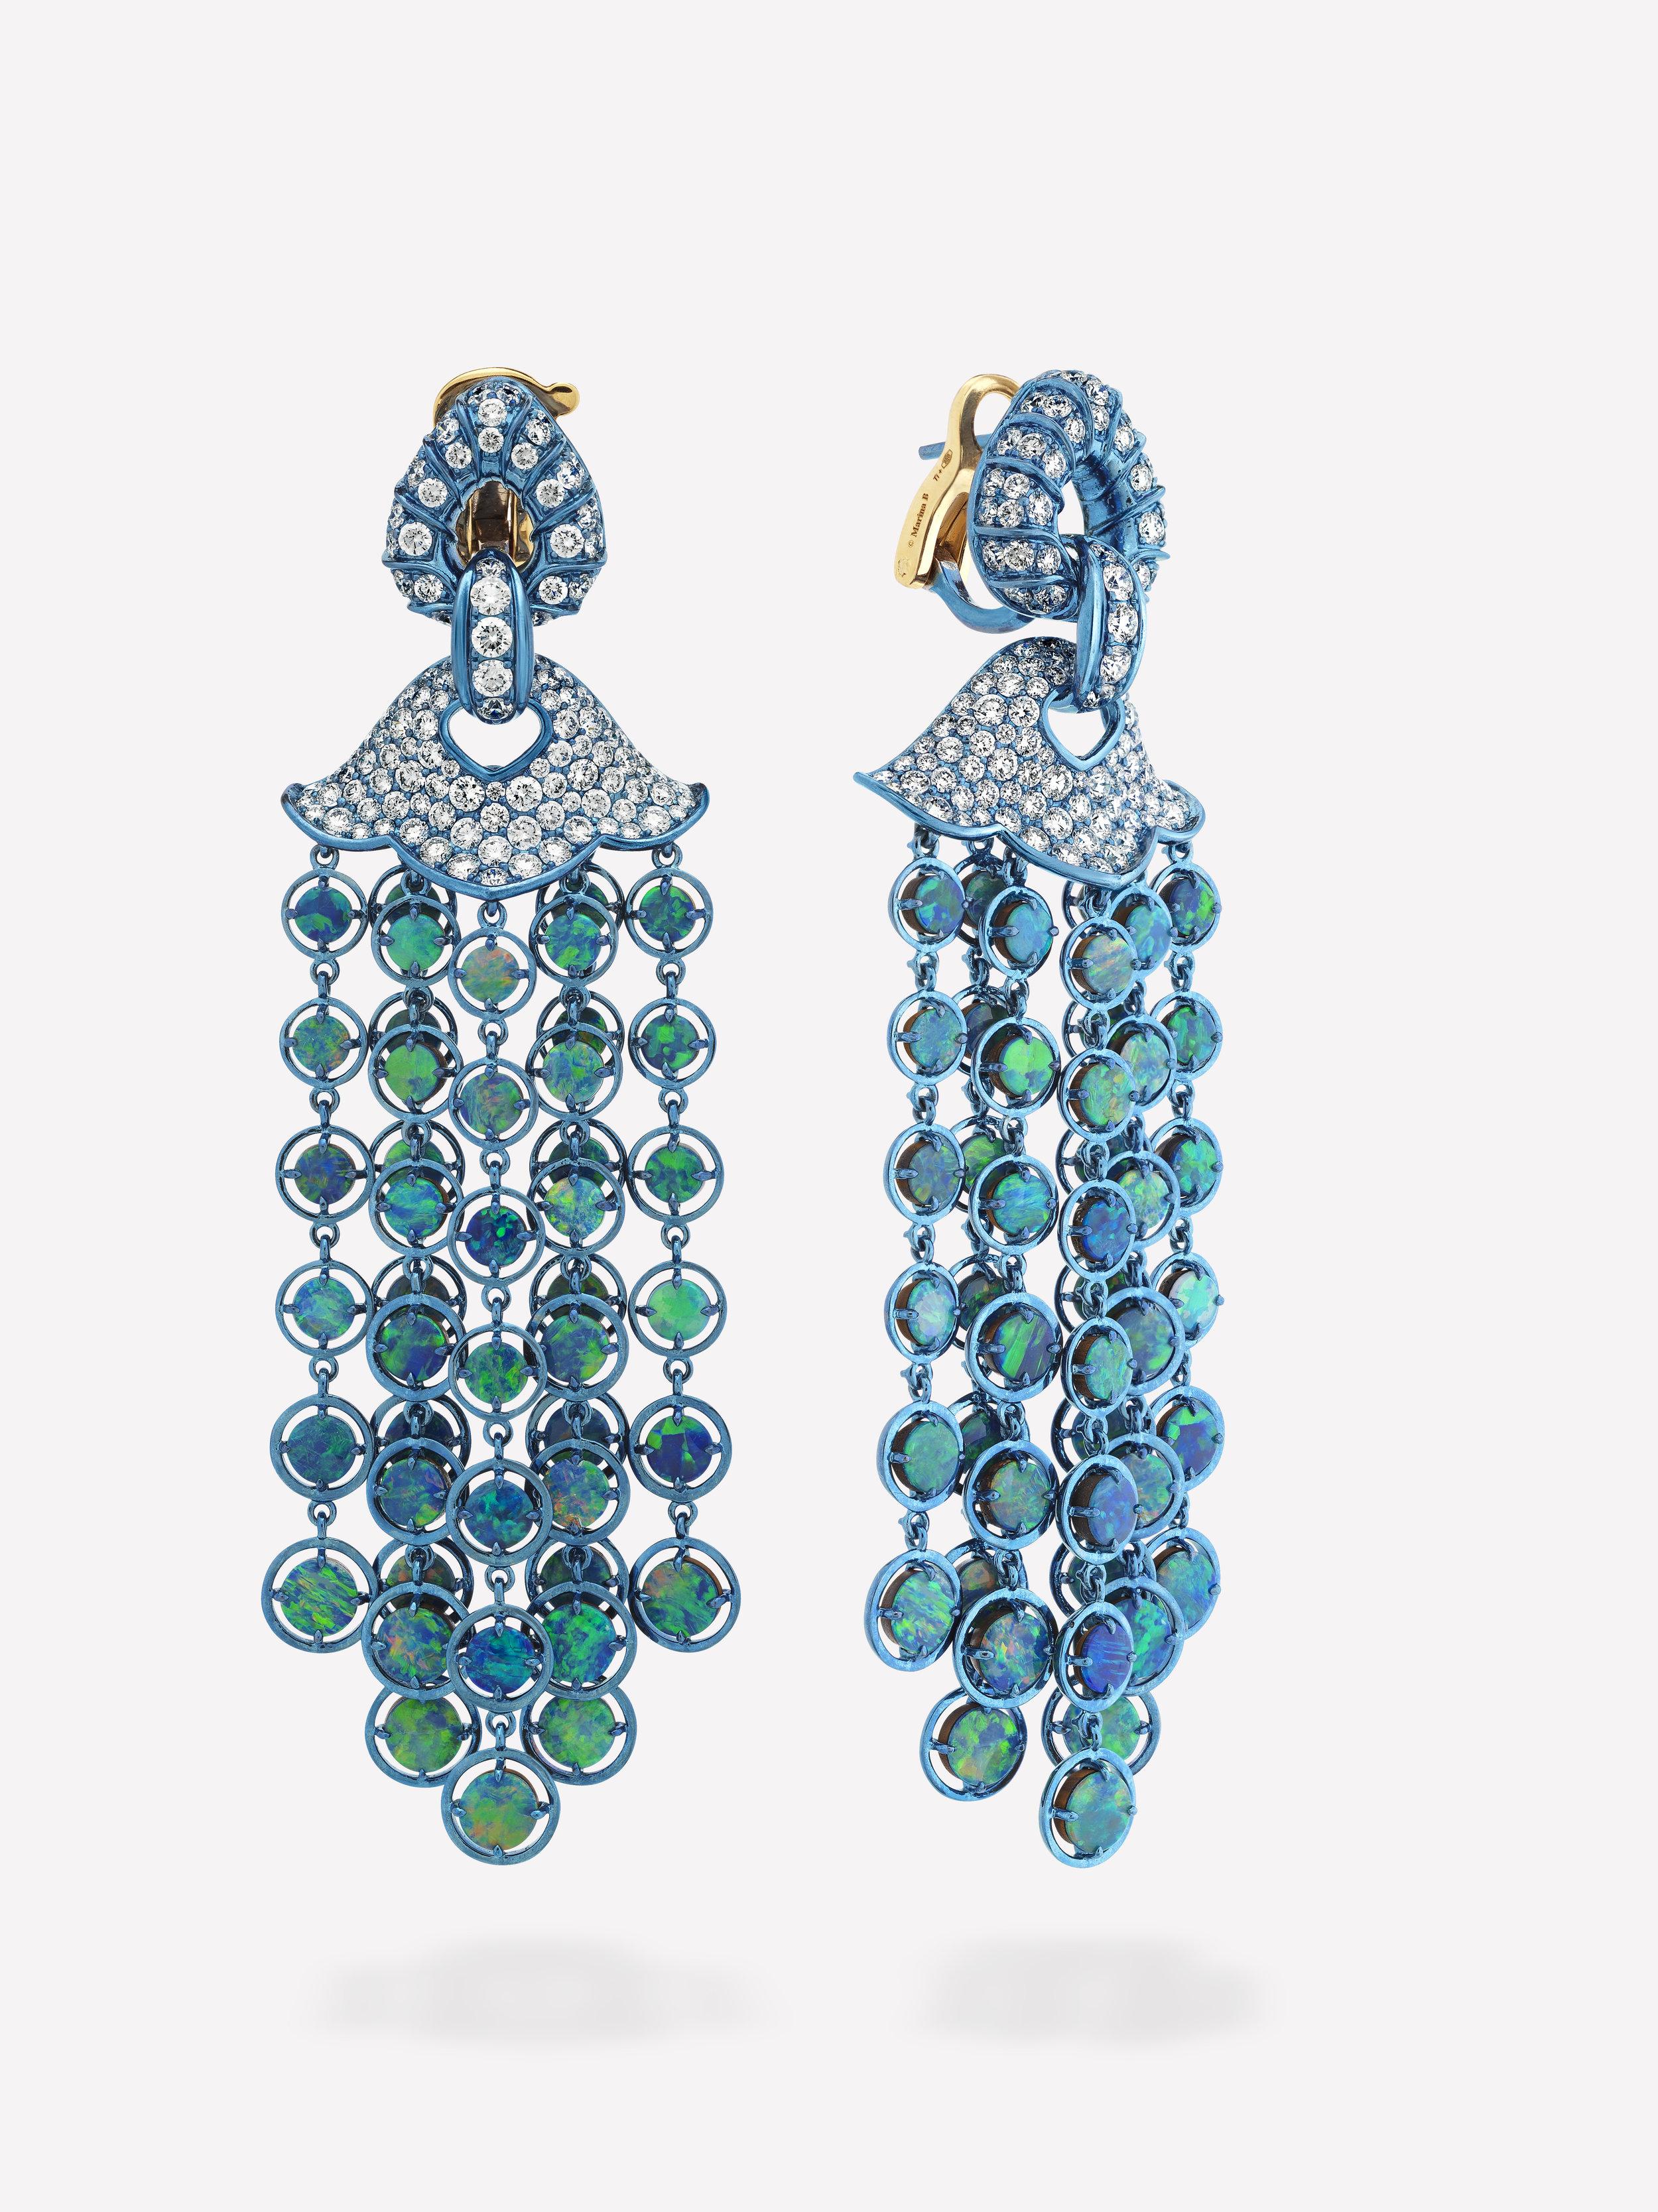 Marina B - Titanium Pampilles Earrings with Opal.jpg